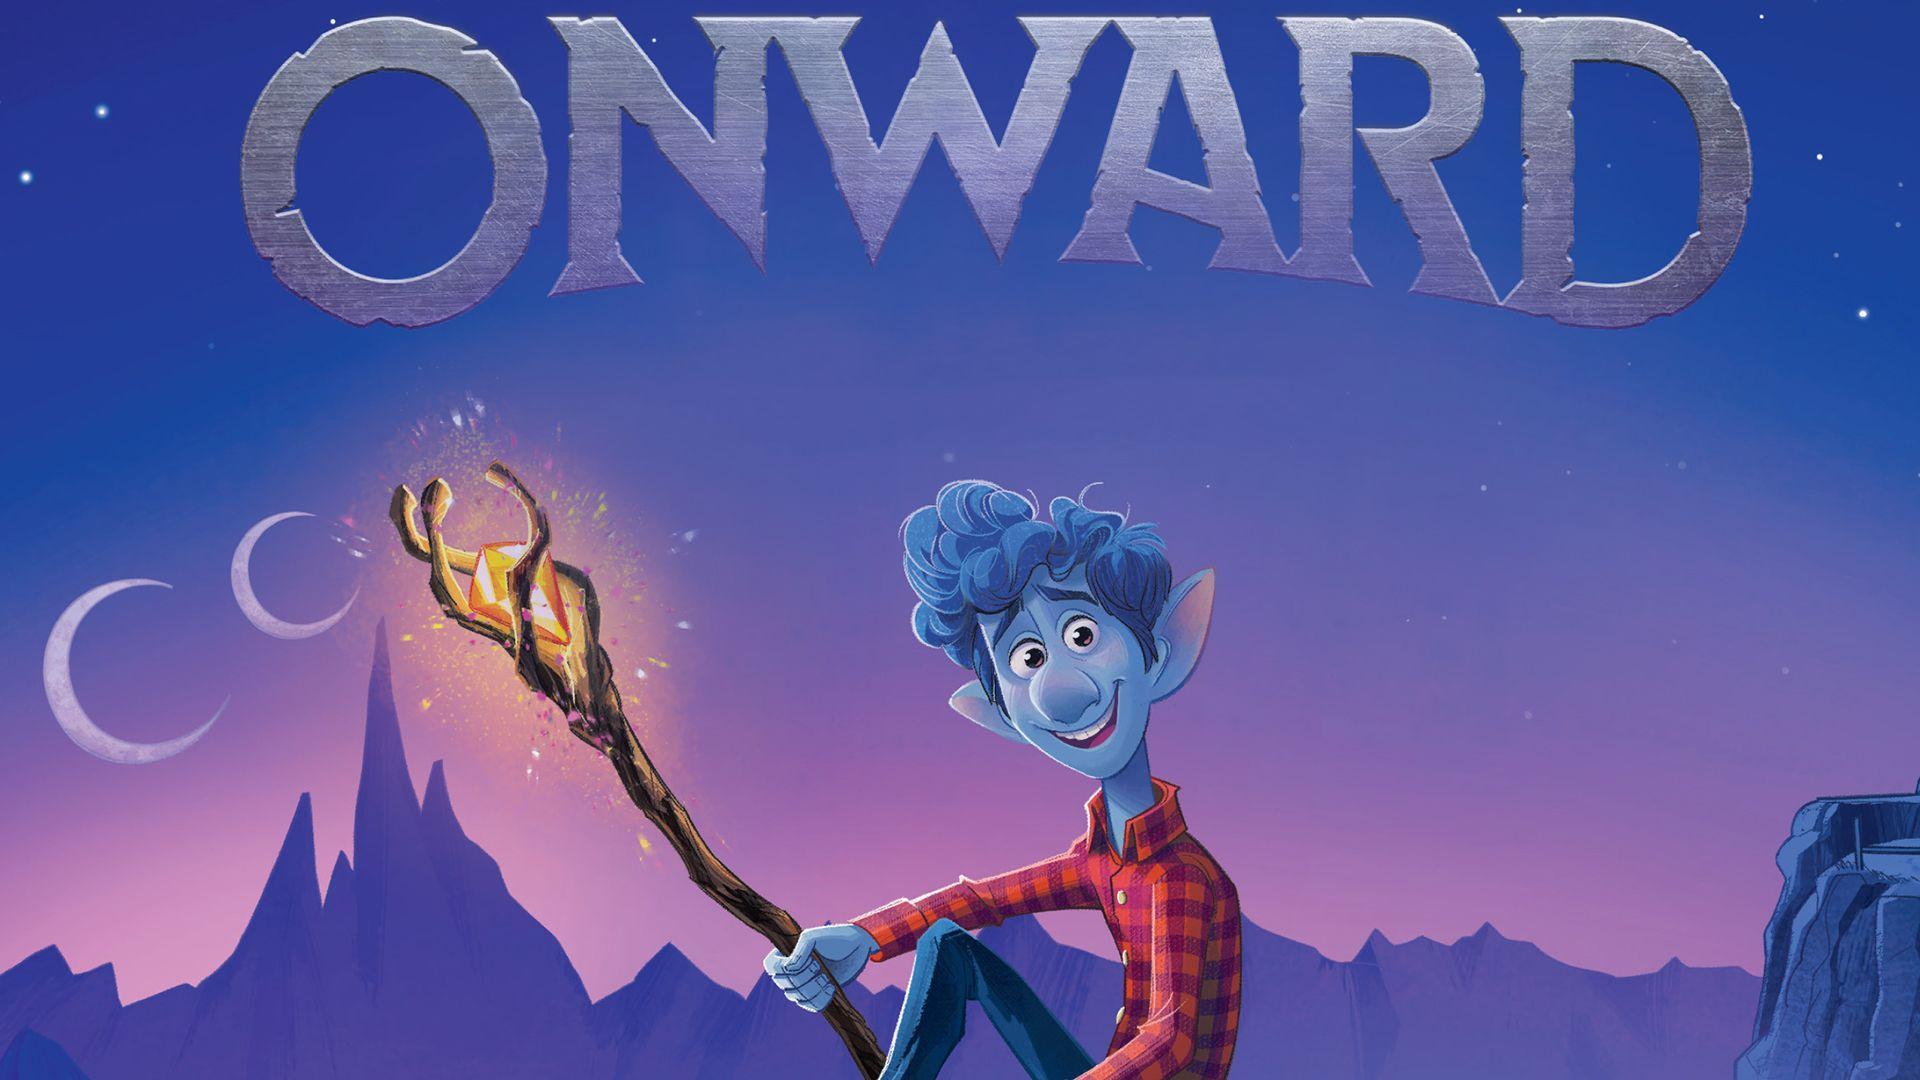 pixar s onward 2020 wallpapers